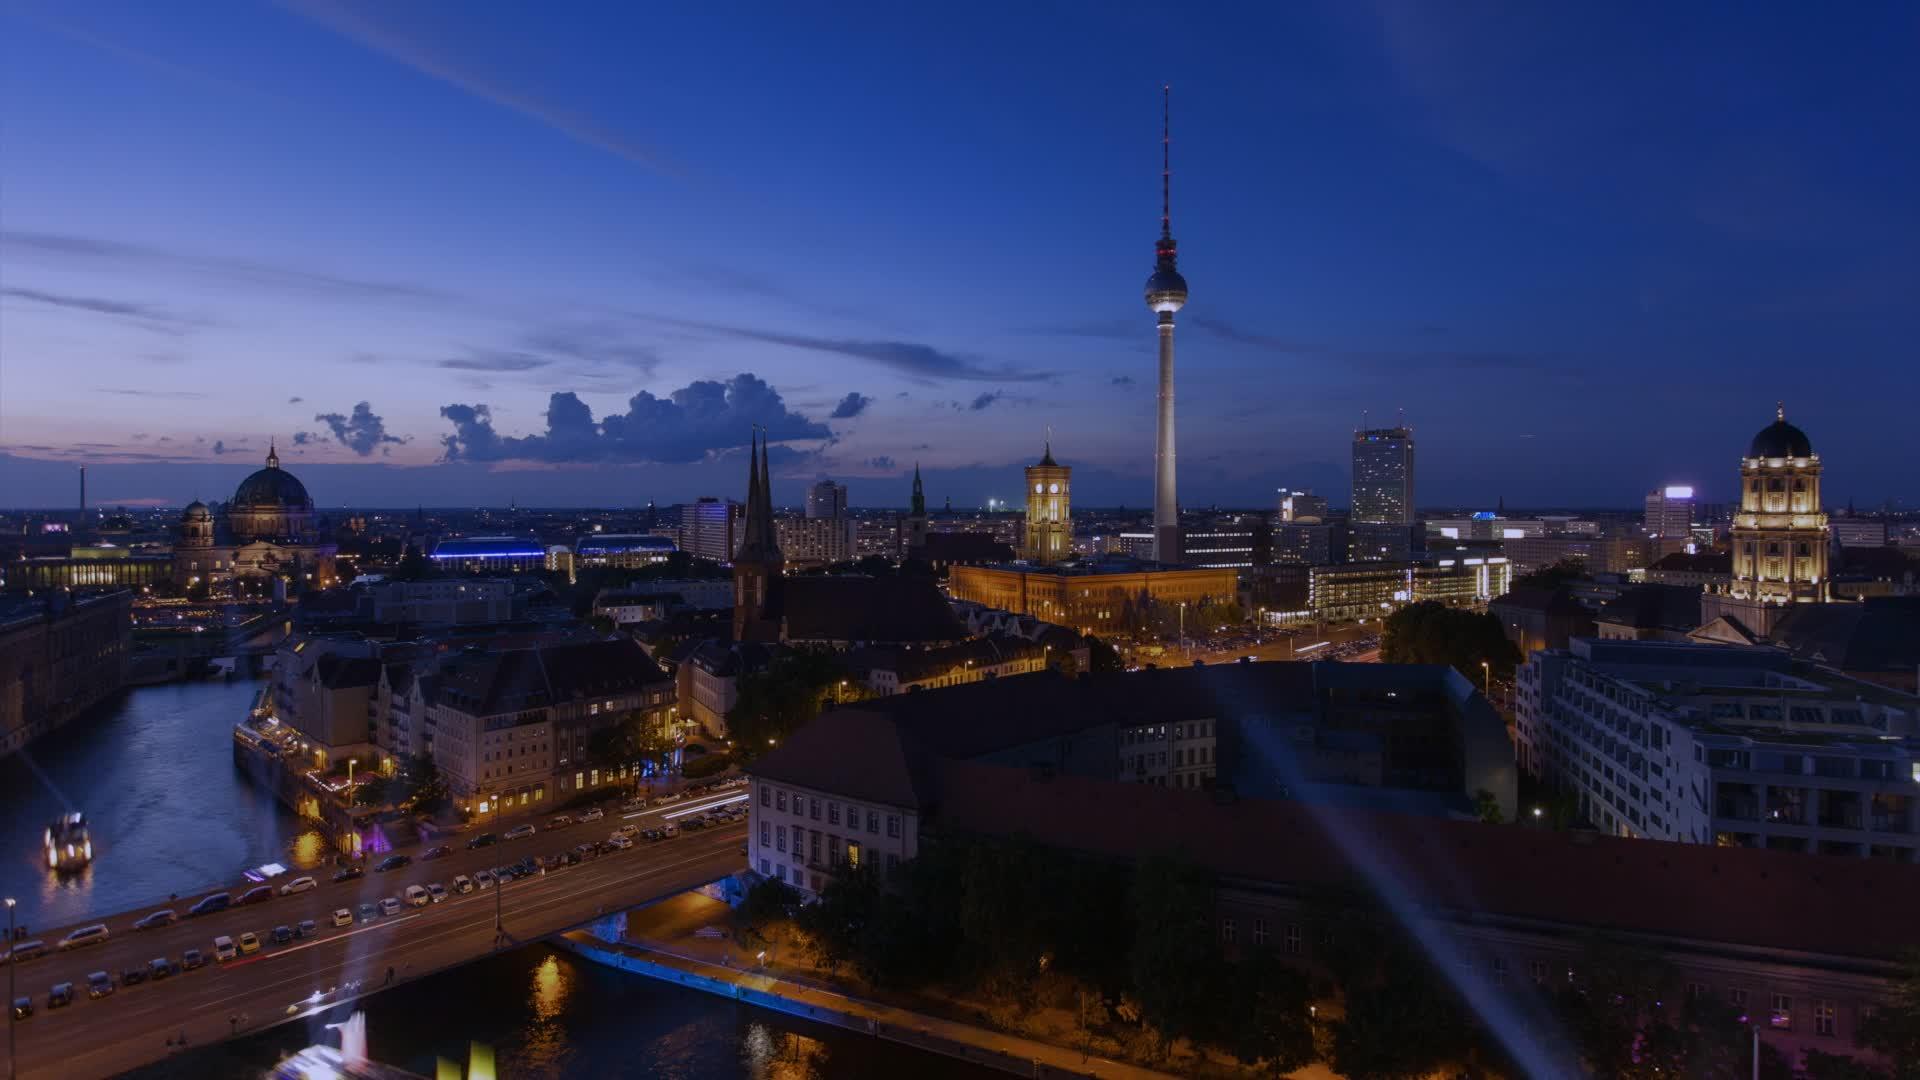 AUFA 2014 Kick off - Team Berlin vereint Individualität und Kollektivität